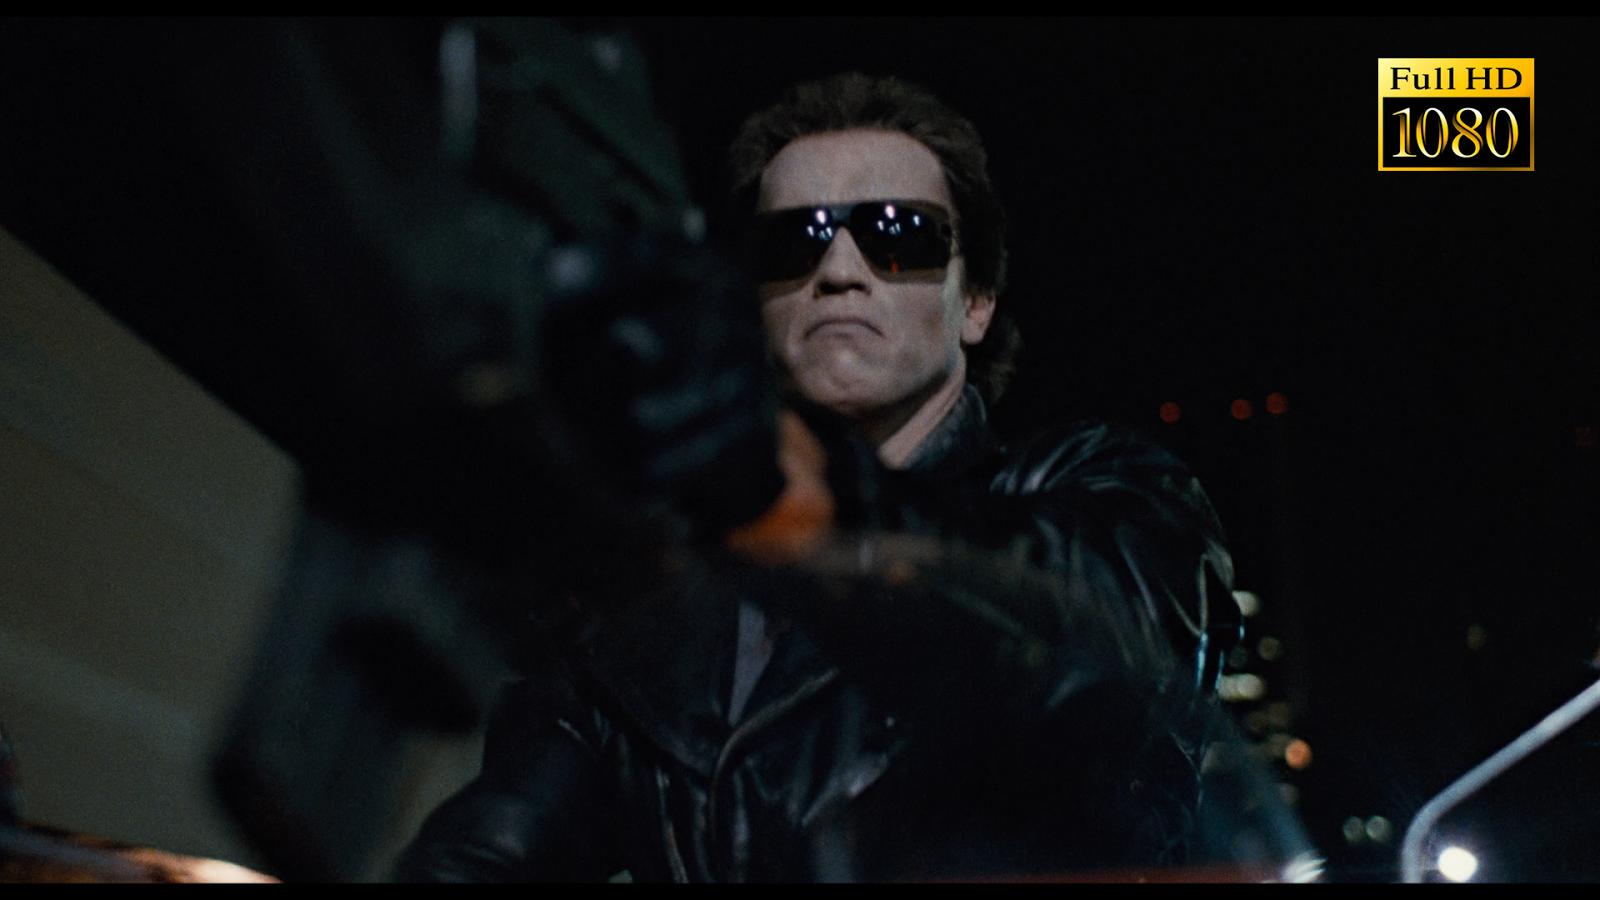 Terminator 1 1984 Uhd 4k 2160p Trial Latino Descargatelotodo